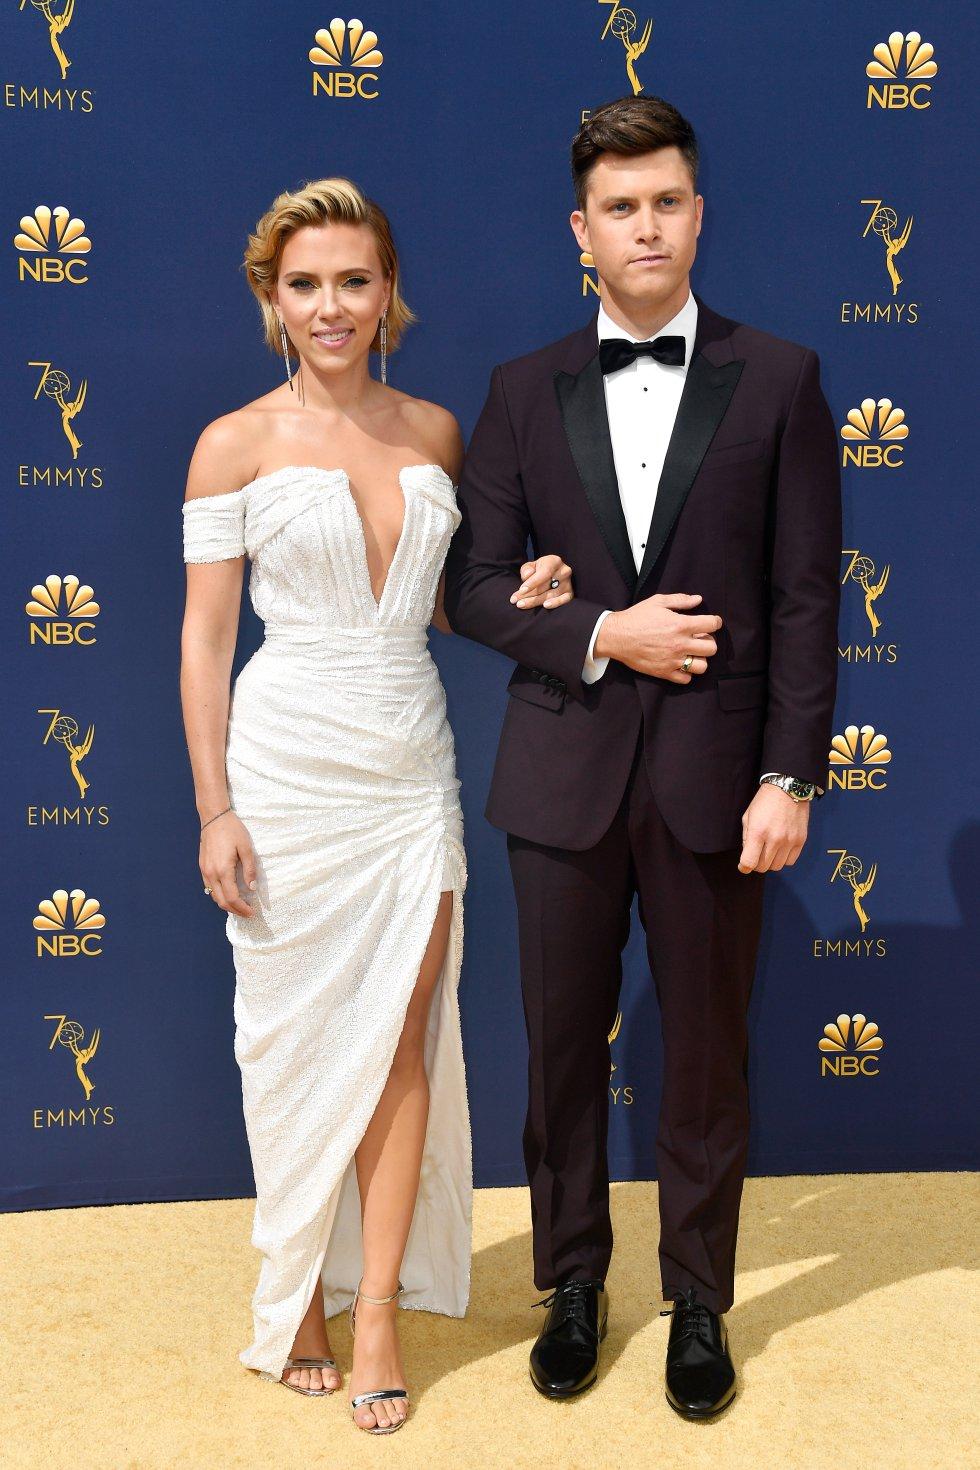 Scarlett Johansson y Colin JostElla llevaba un vestido de Balmain, sandalias de Christian Louboutin y joyas de Nikos Koulis. Él de Dolce & Gabbana.